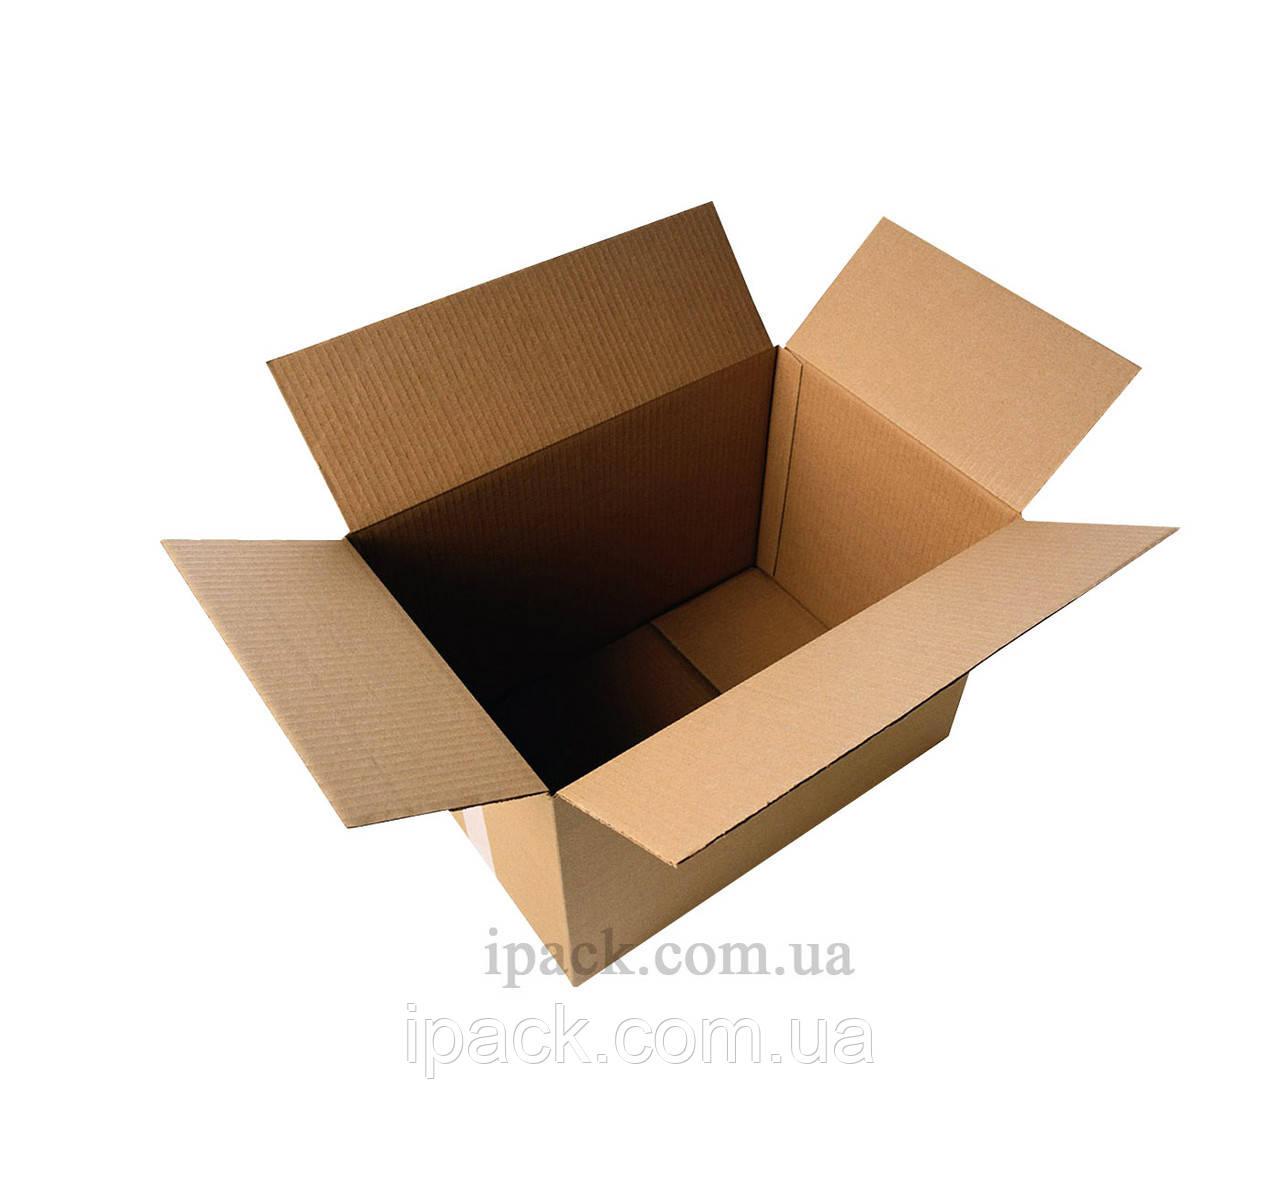 Гофроящик 175*105*80 мм, бурый, четырехклапанный картонный короб